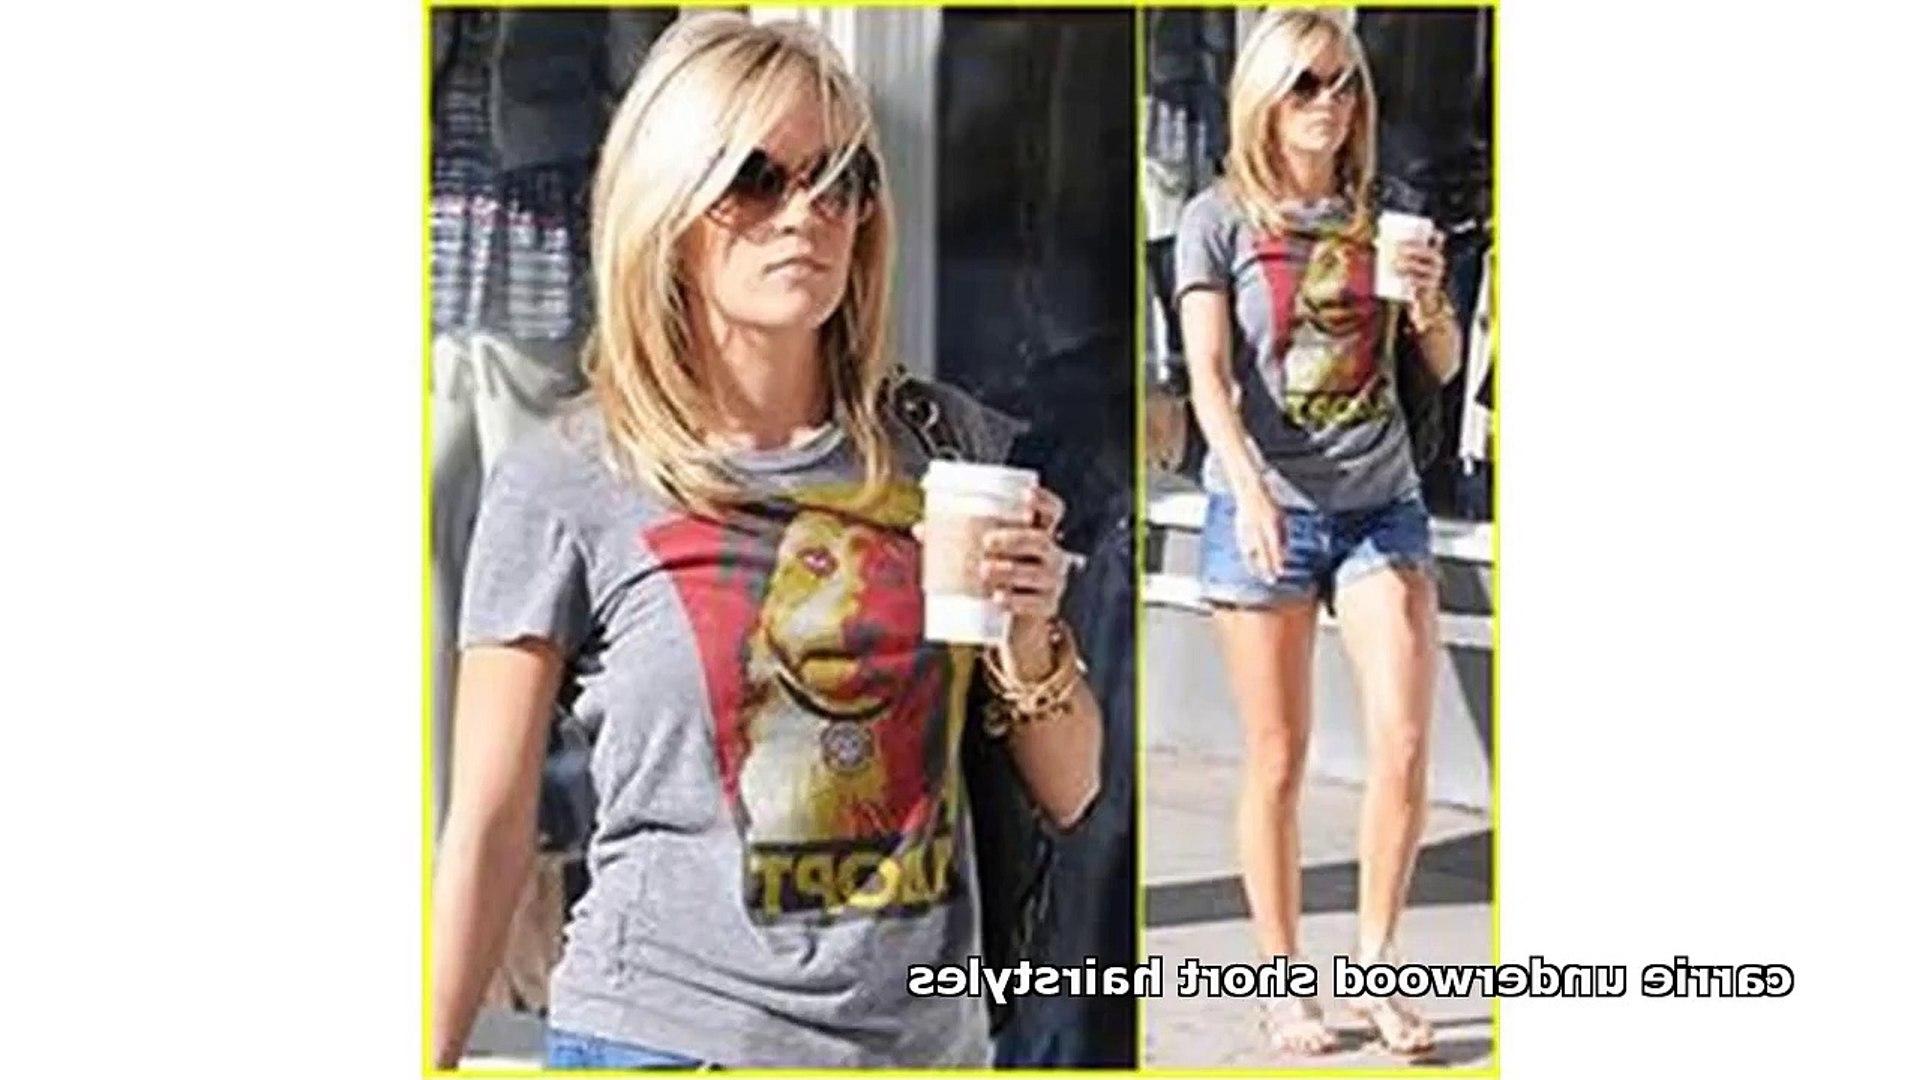 Carrie Underwood Short Hairstyles – Video Dailymotion For Carrie Underwood Short Haircuts (View 12 of 25)